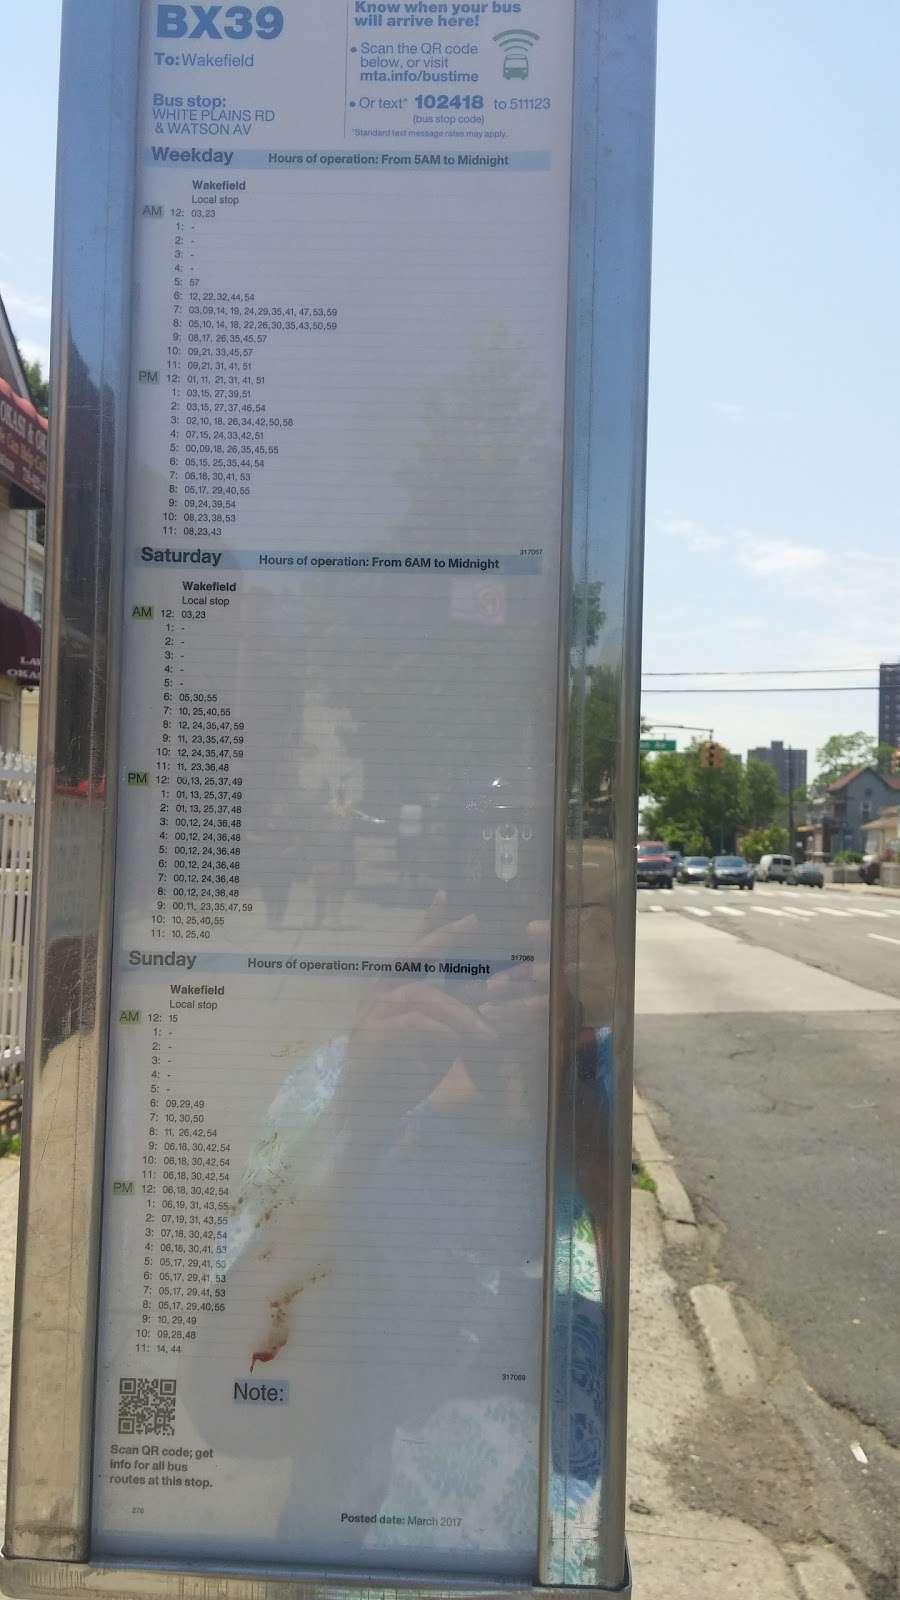 White Plains Rd/watson Av - bus station  | Photo 1 of 1 | Address: Bronx, NY 10472, USA